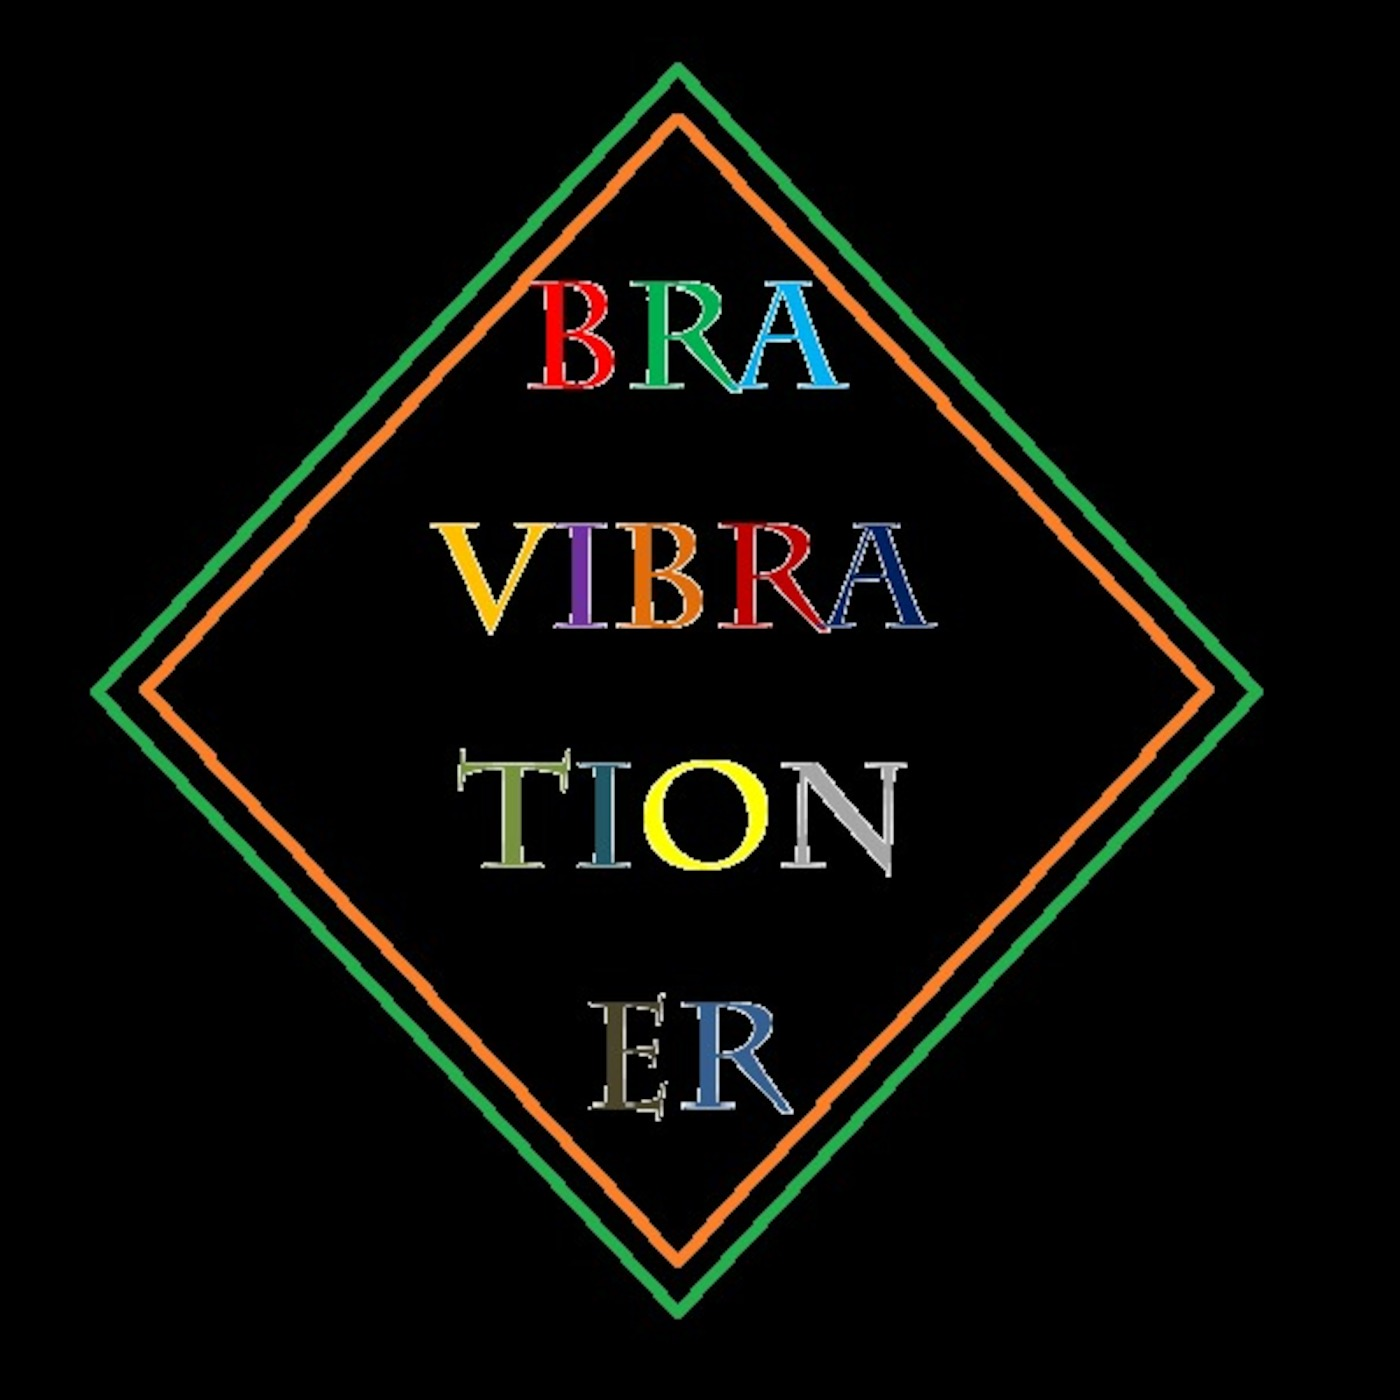 Bra vibrationer